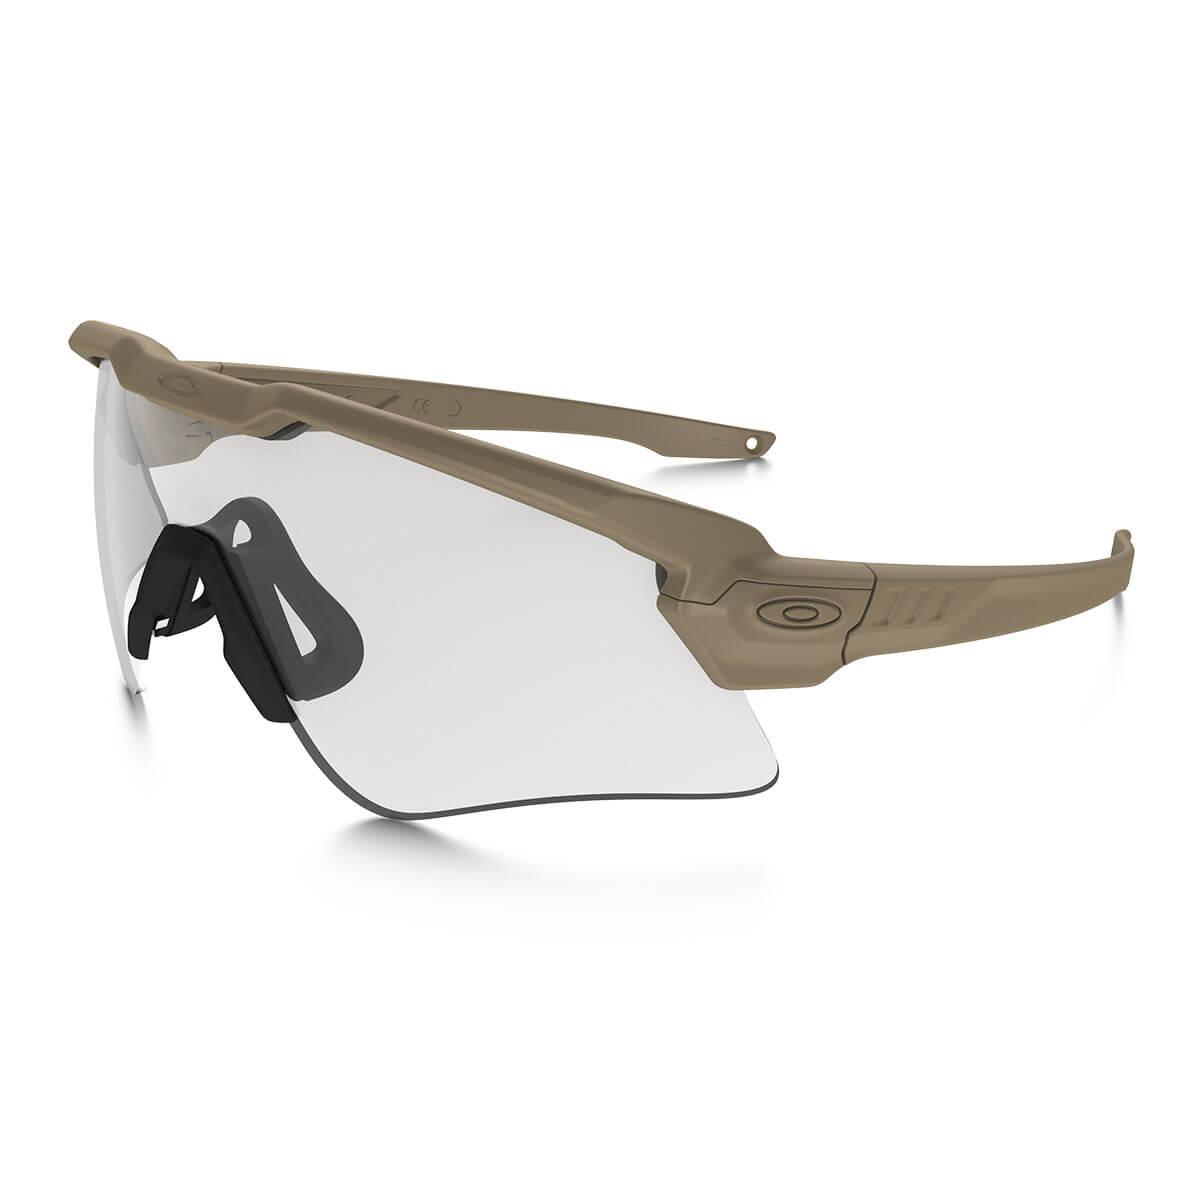 42d8de6578 Oakley - SI Ballistic M Frame Alpha Array - Terrain Tan Frame w  Grey